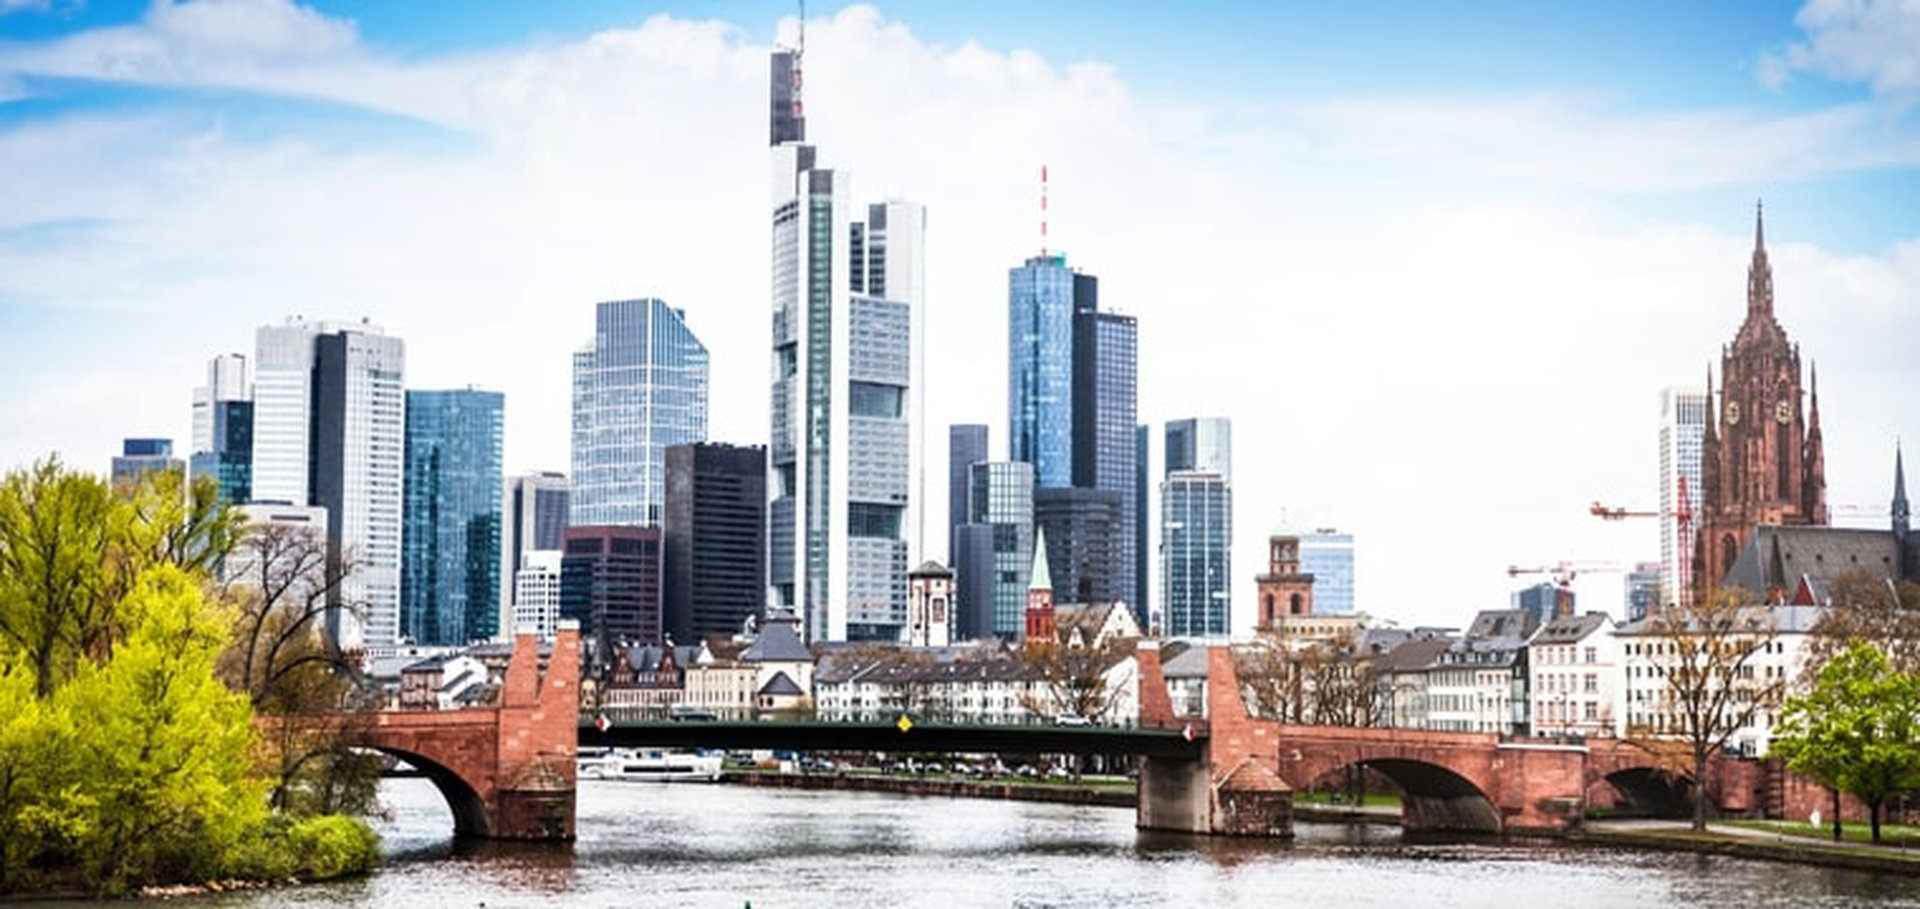 McMakler vor Ort in Frankfurt